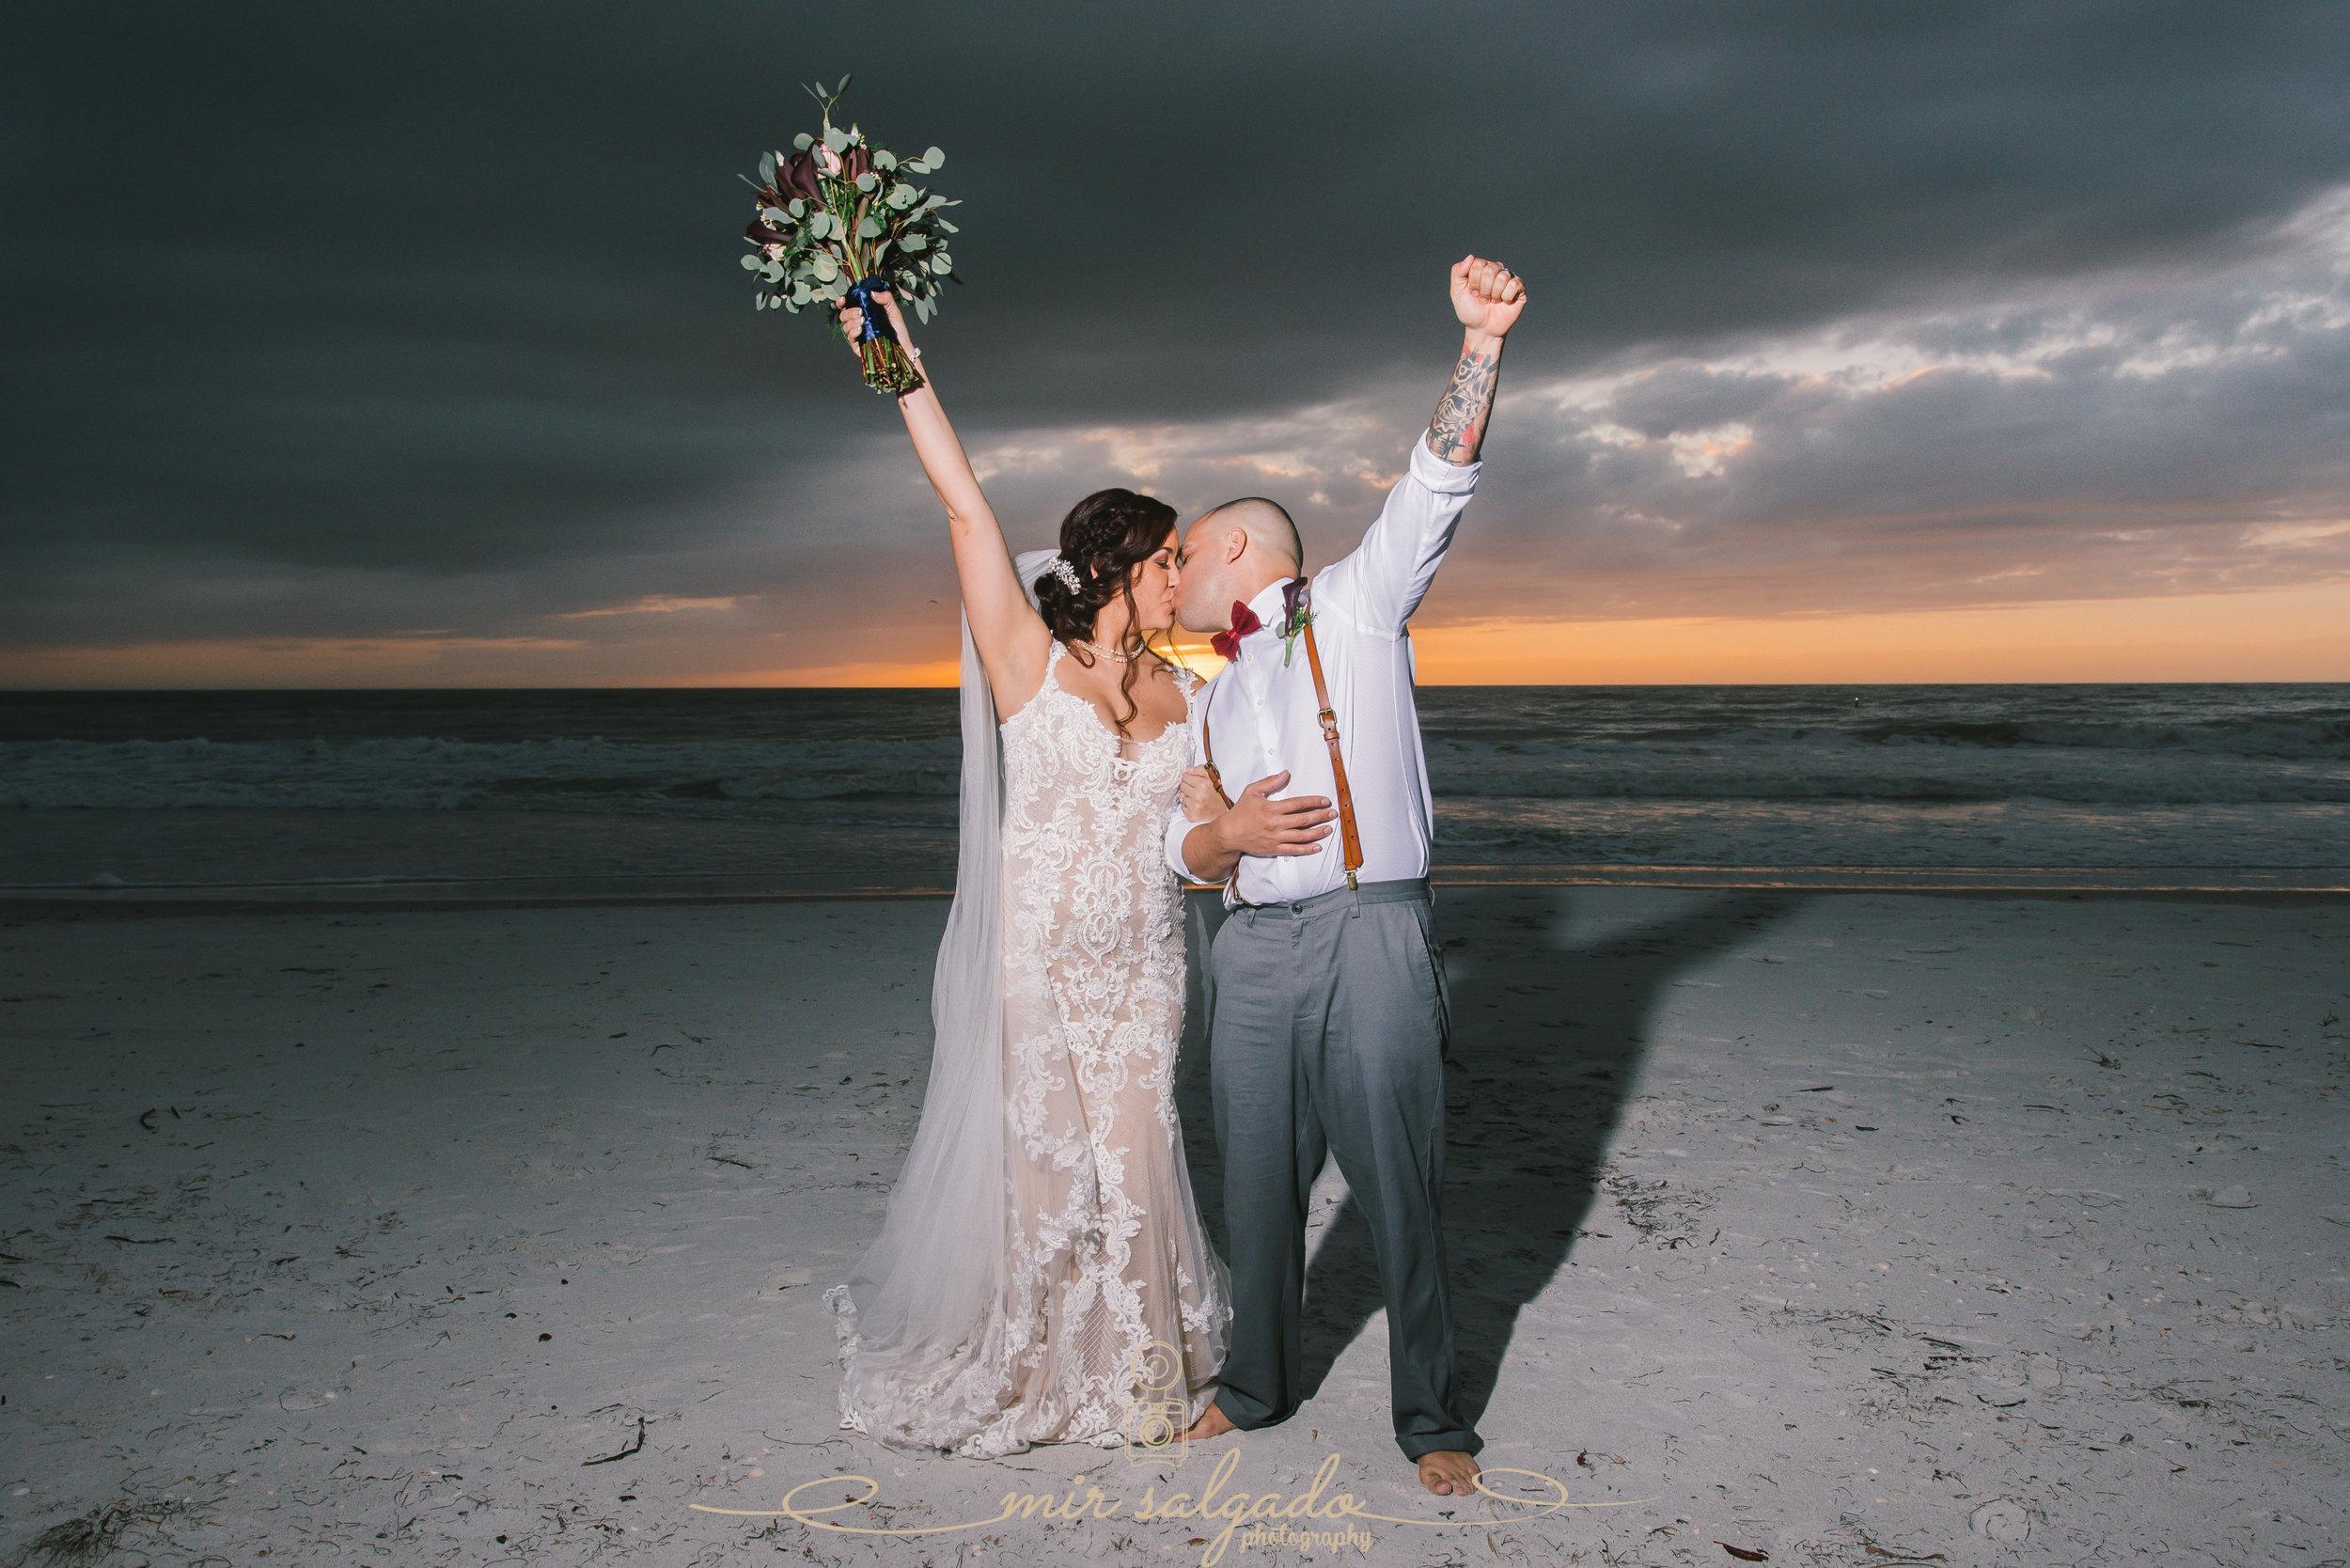 Sunset Beach wedding - Treasure Island, Fl